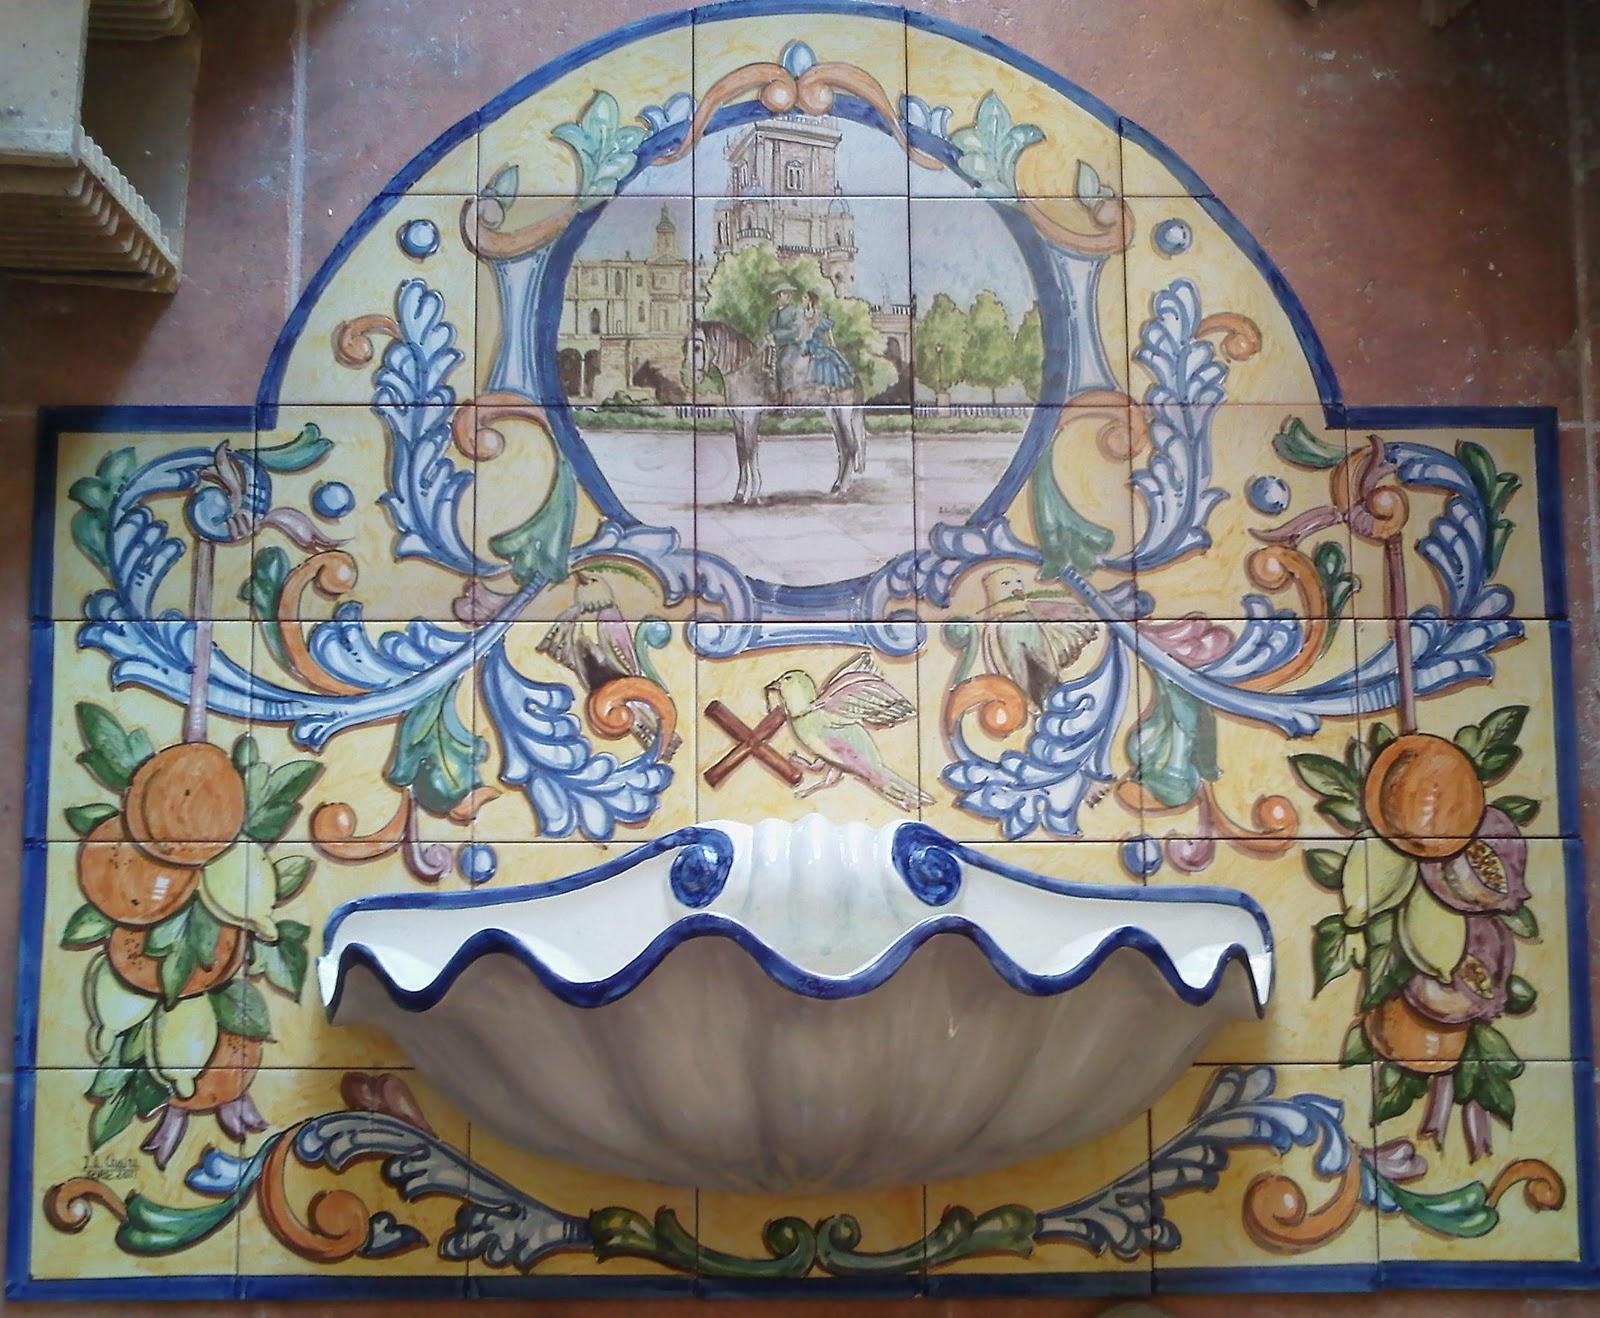 Ceramica art stica jose antonio chaira fuente renacimiento - Murales de ceramica artistica ...